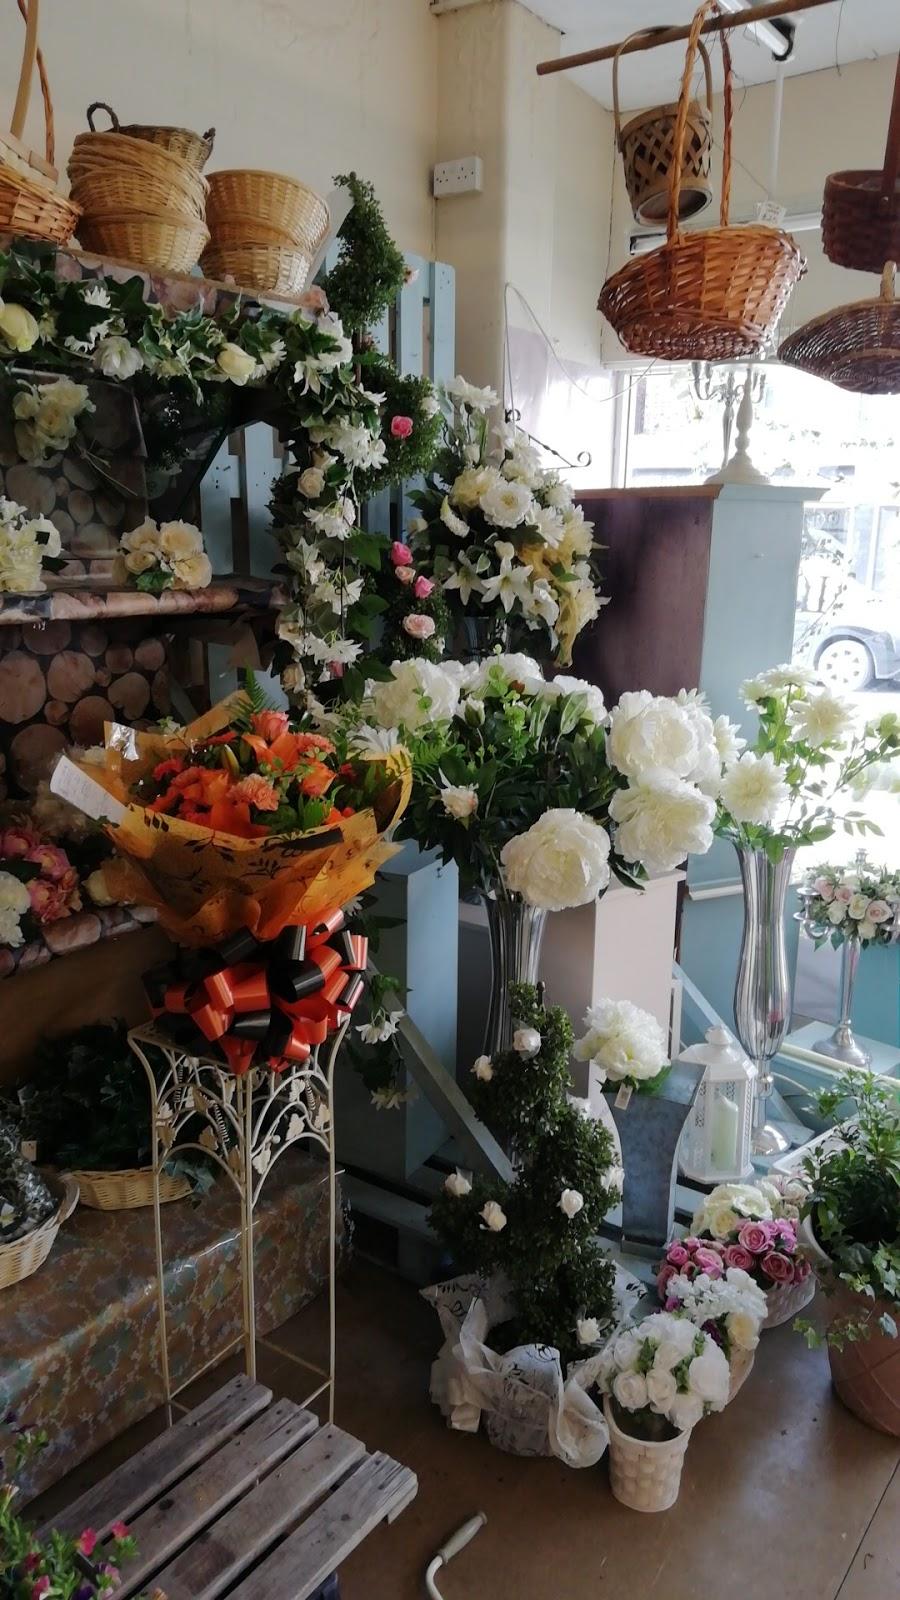 Milners Florist